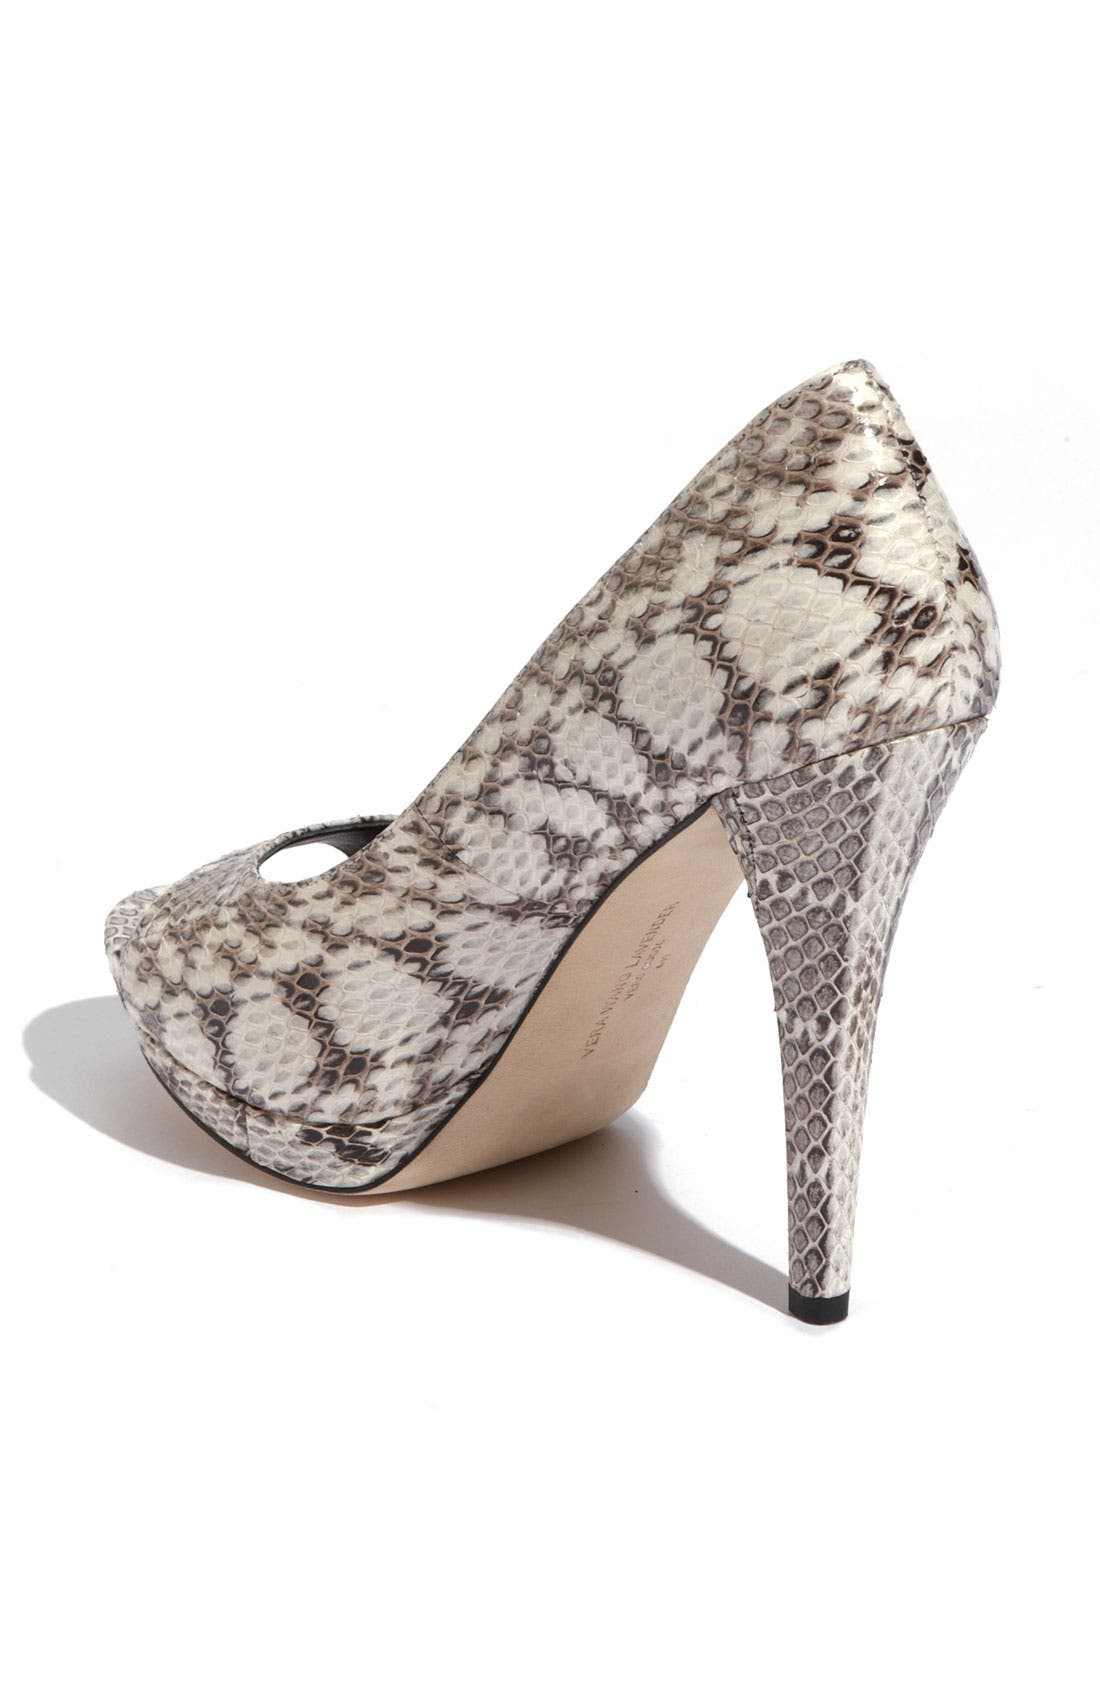 Footwear 'Selima' Peep Toe Pump,                             Alternate thumbnail 16, color,